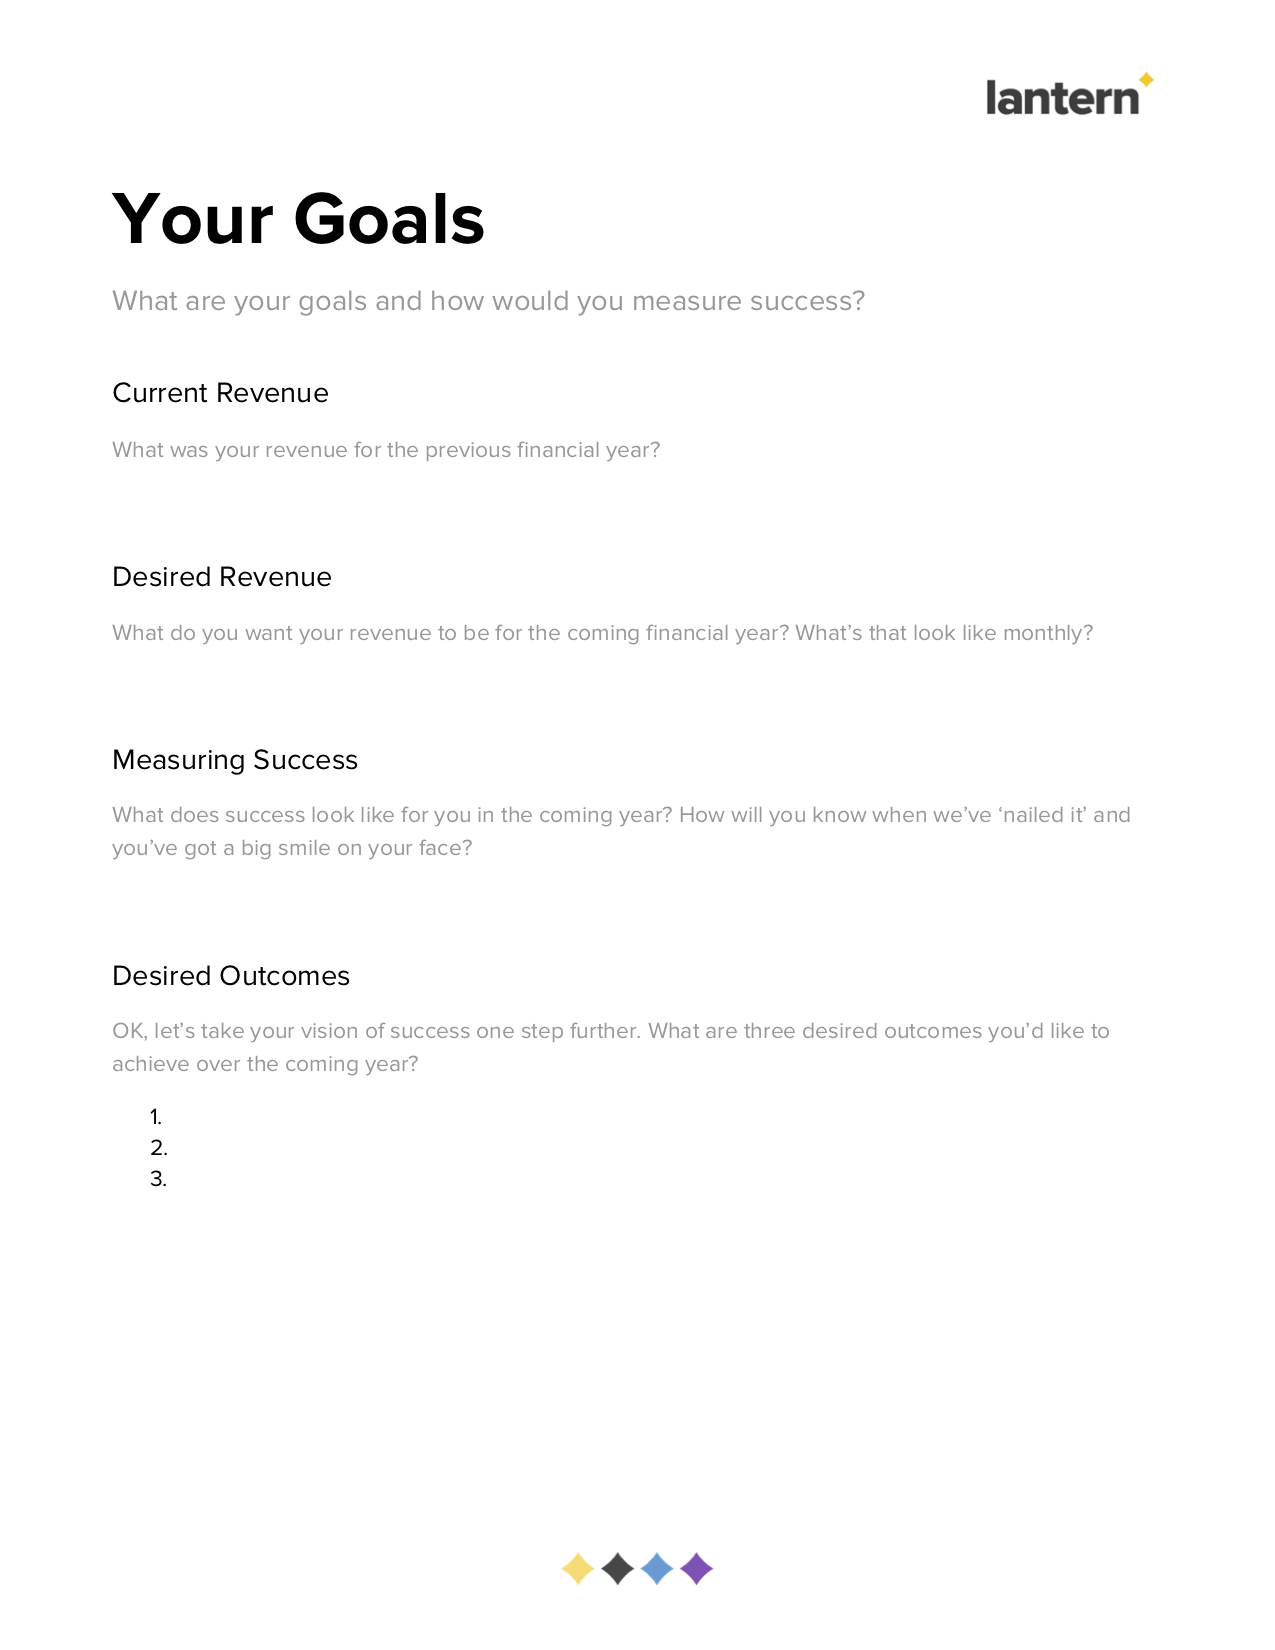 Marketing Roadmap Kickoff Questions_4.png